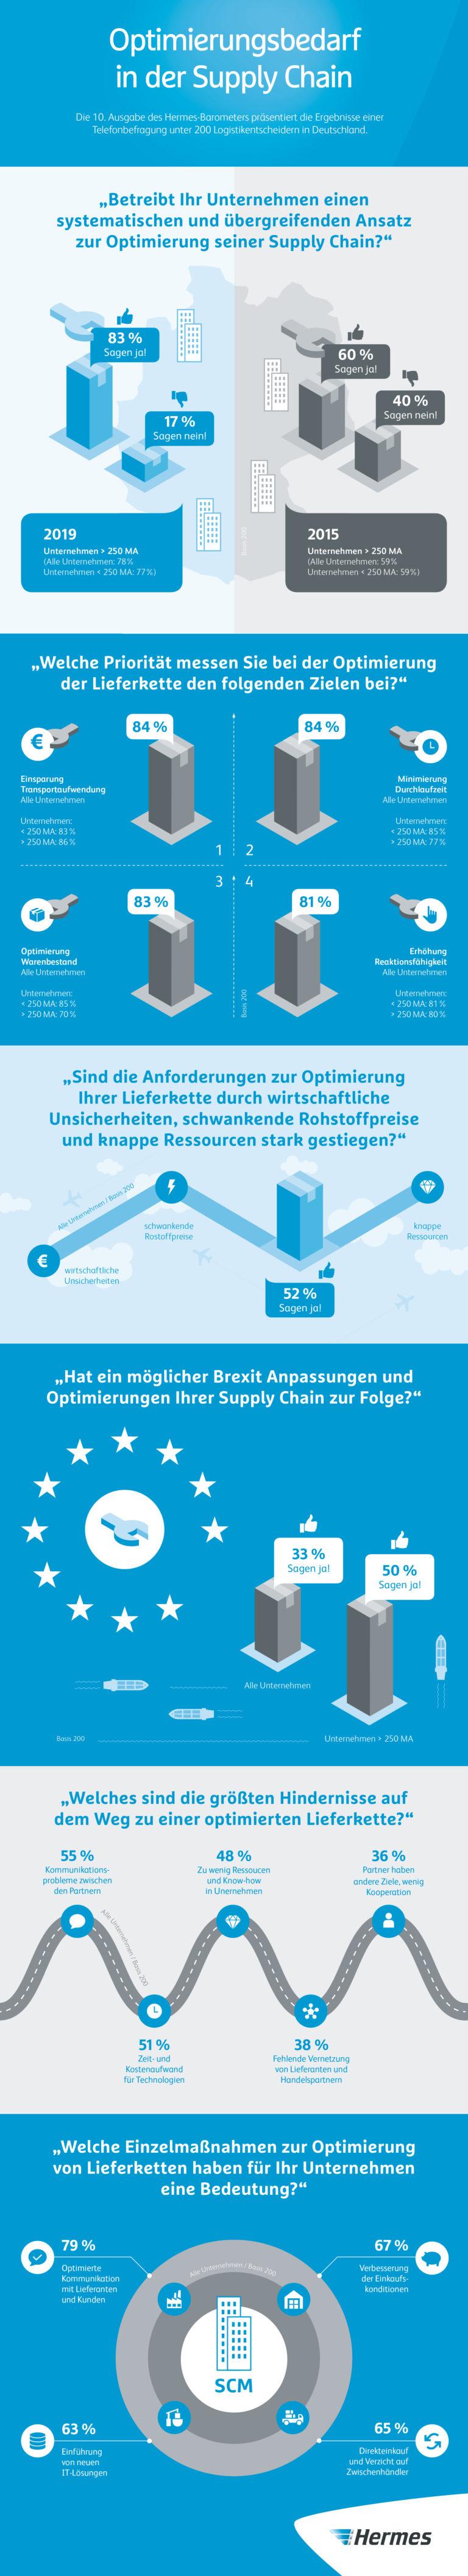 Infografik: 10. Hermes-Barometer: Optimierungsbedarf in der Supply Chain (JPG)    infografik, studie, barometer, scs